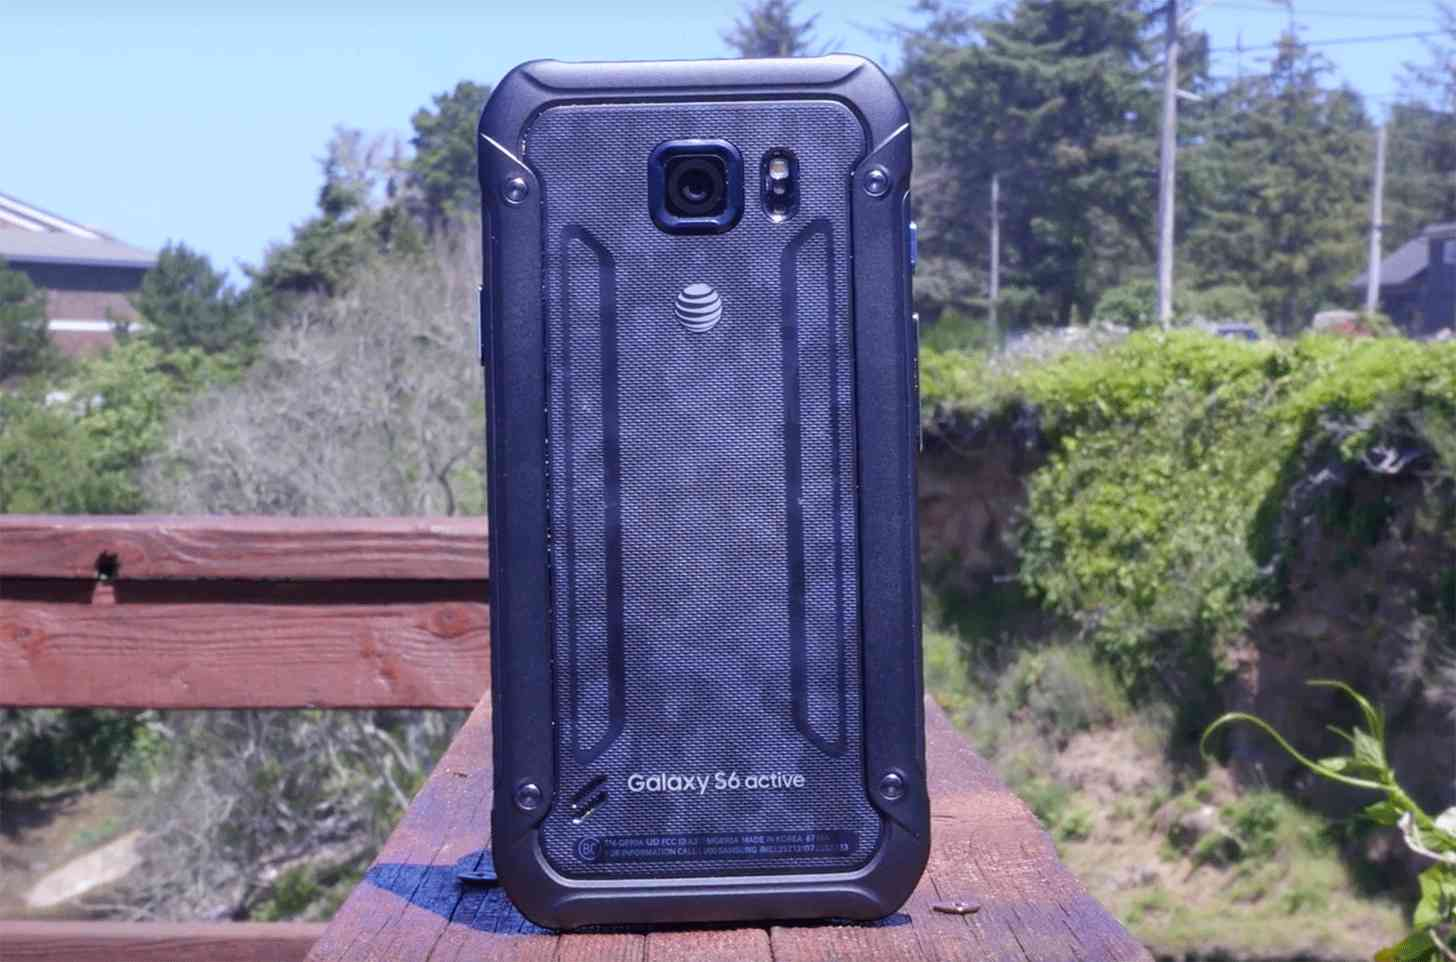 AT&T Samsung Galaxy S6 active large